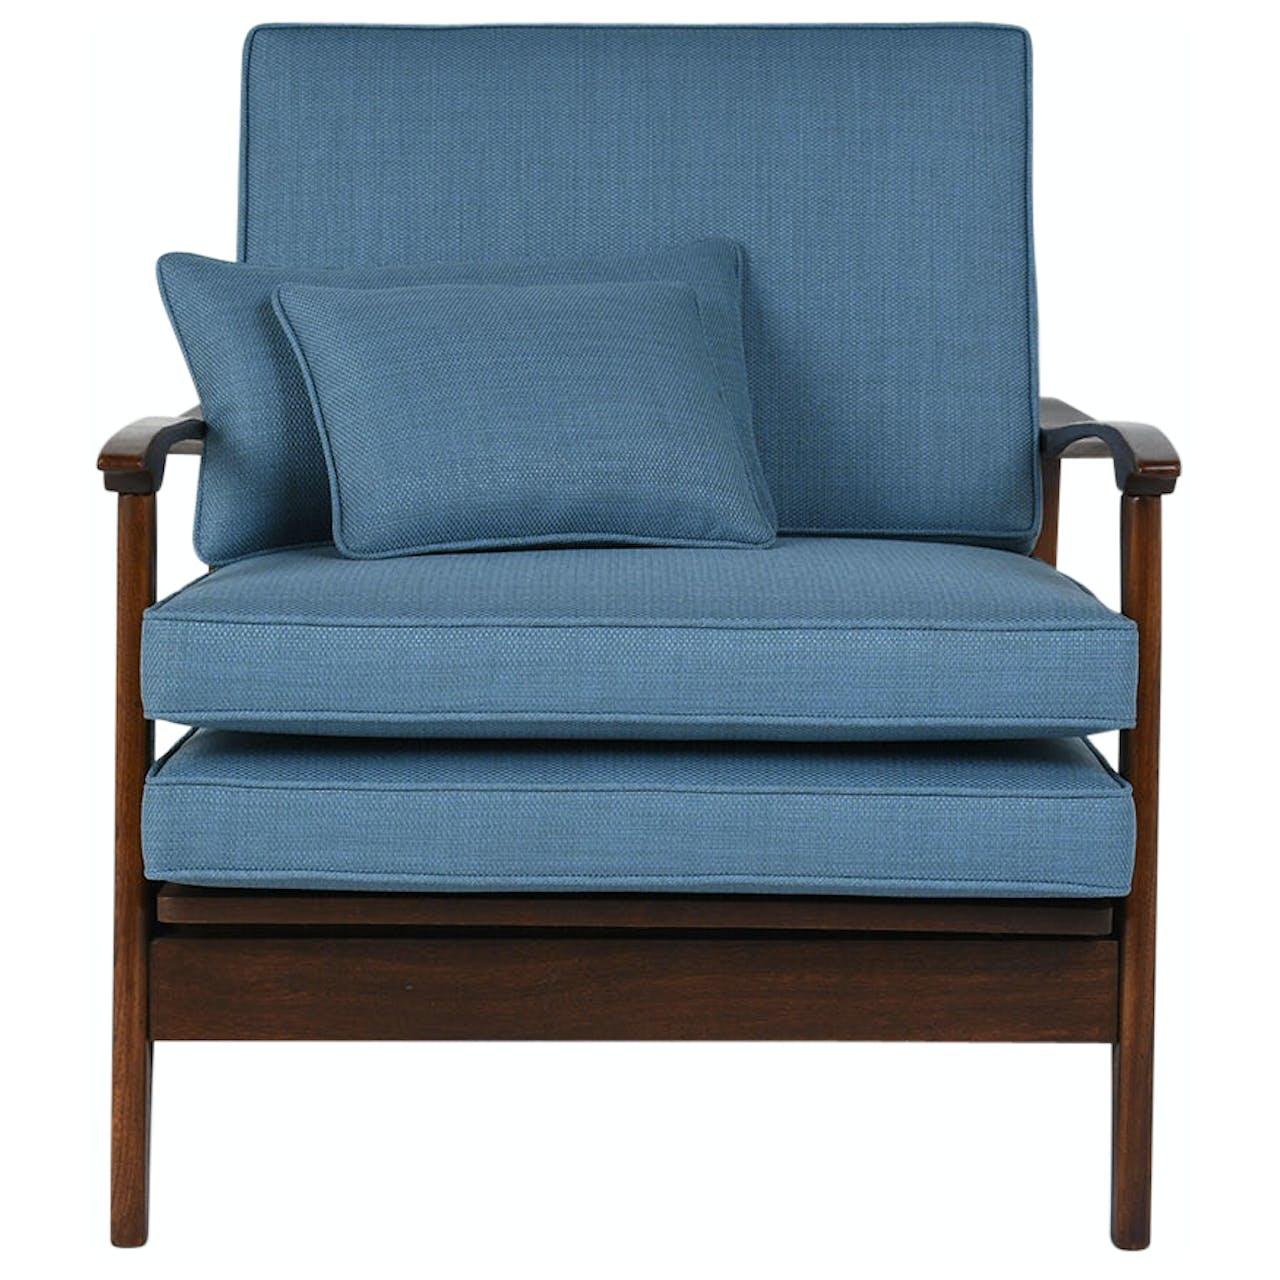 Outstanding Vintage 1960S Mid Century Modern Reclining Lounge Chair Short Links Chair Design For Home Short Linksinfo